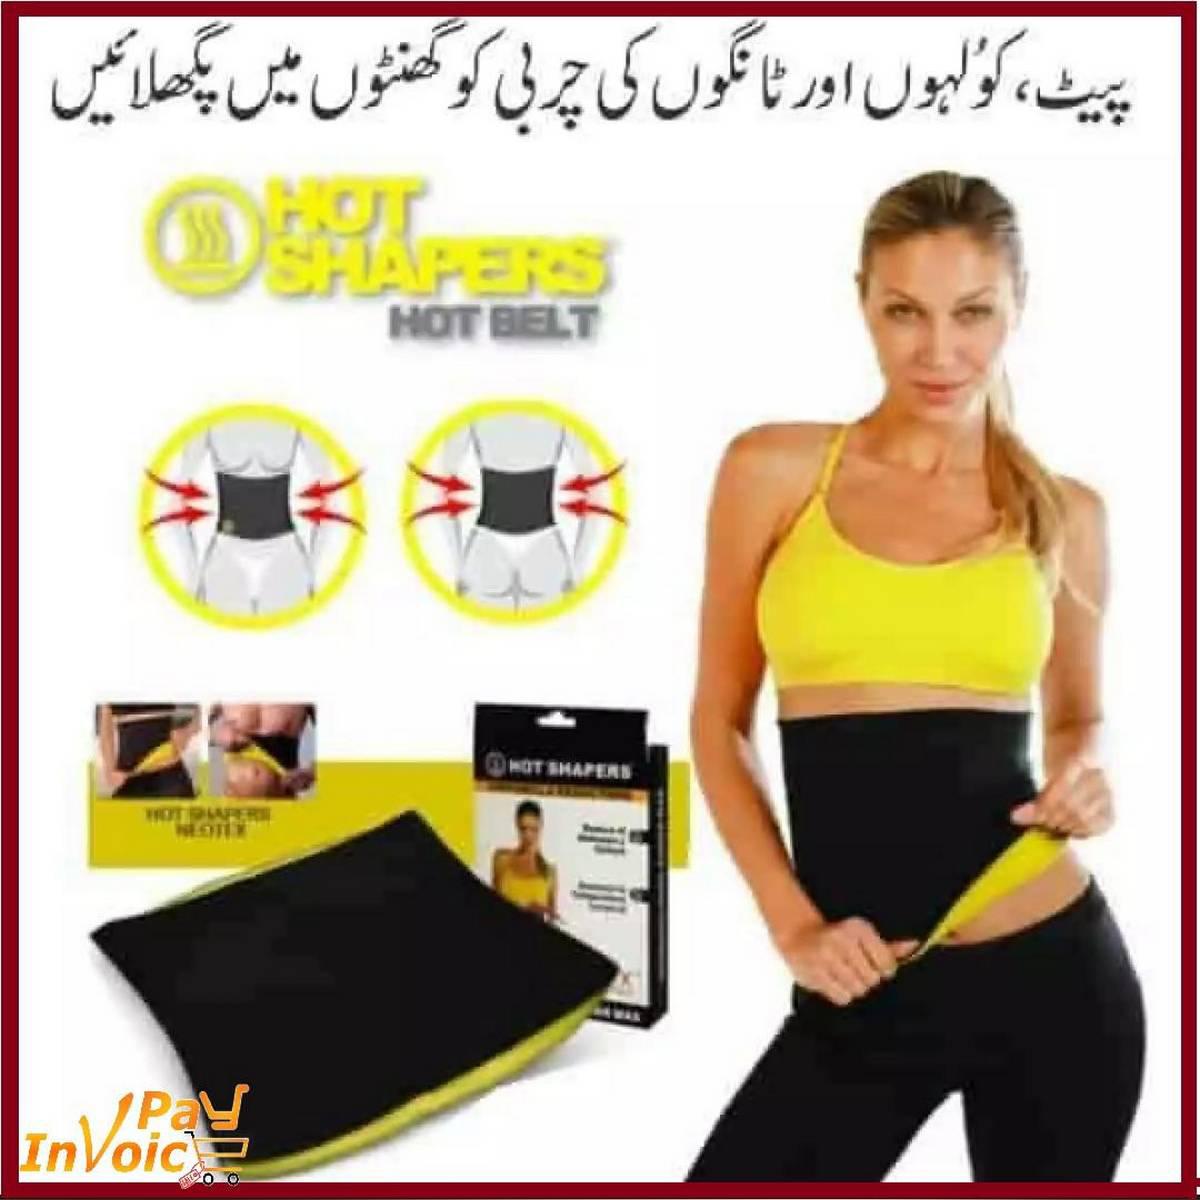 IP Hot Shapers Belly Slimming Belt / Tummy Trimmer Belly Fat Burner Lean Body for Men & Women / Hot Belt unisex